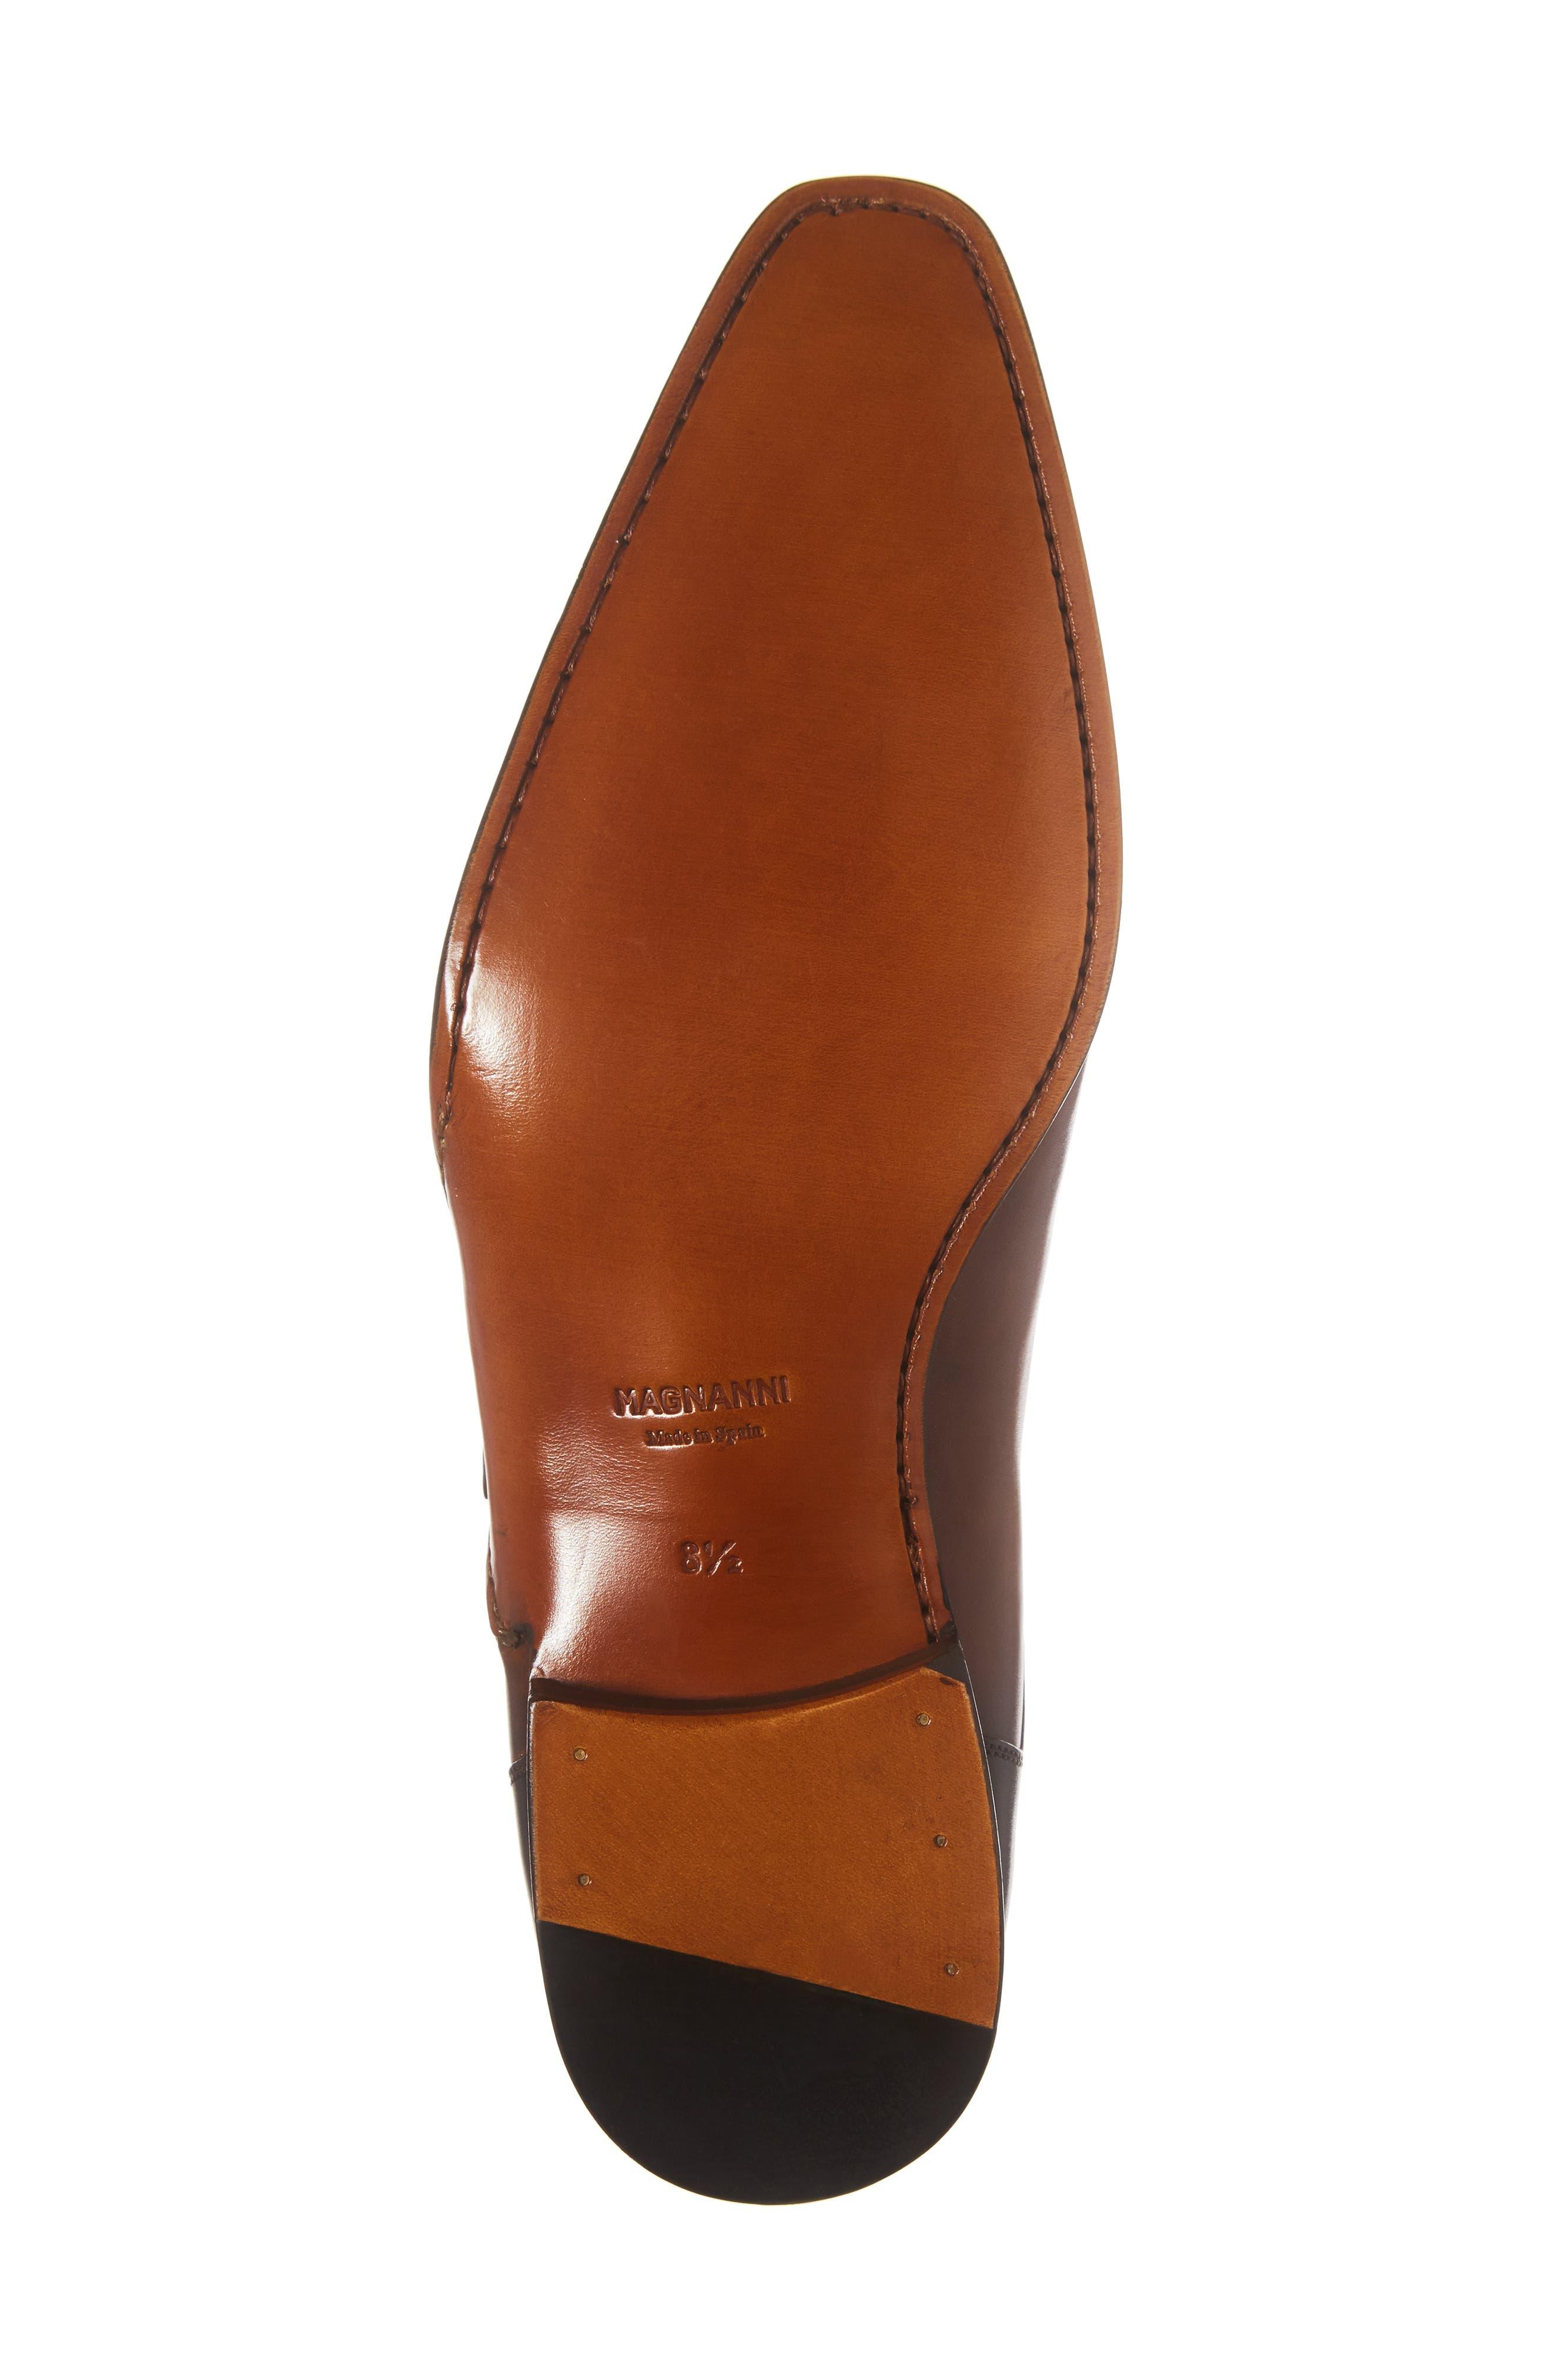 MAGNANNI, Ondara Double Monk Strap Shoe, Alternate thumbnail 6, color, CUERO/ BROWN LEATHER